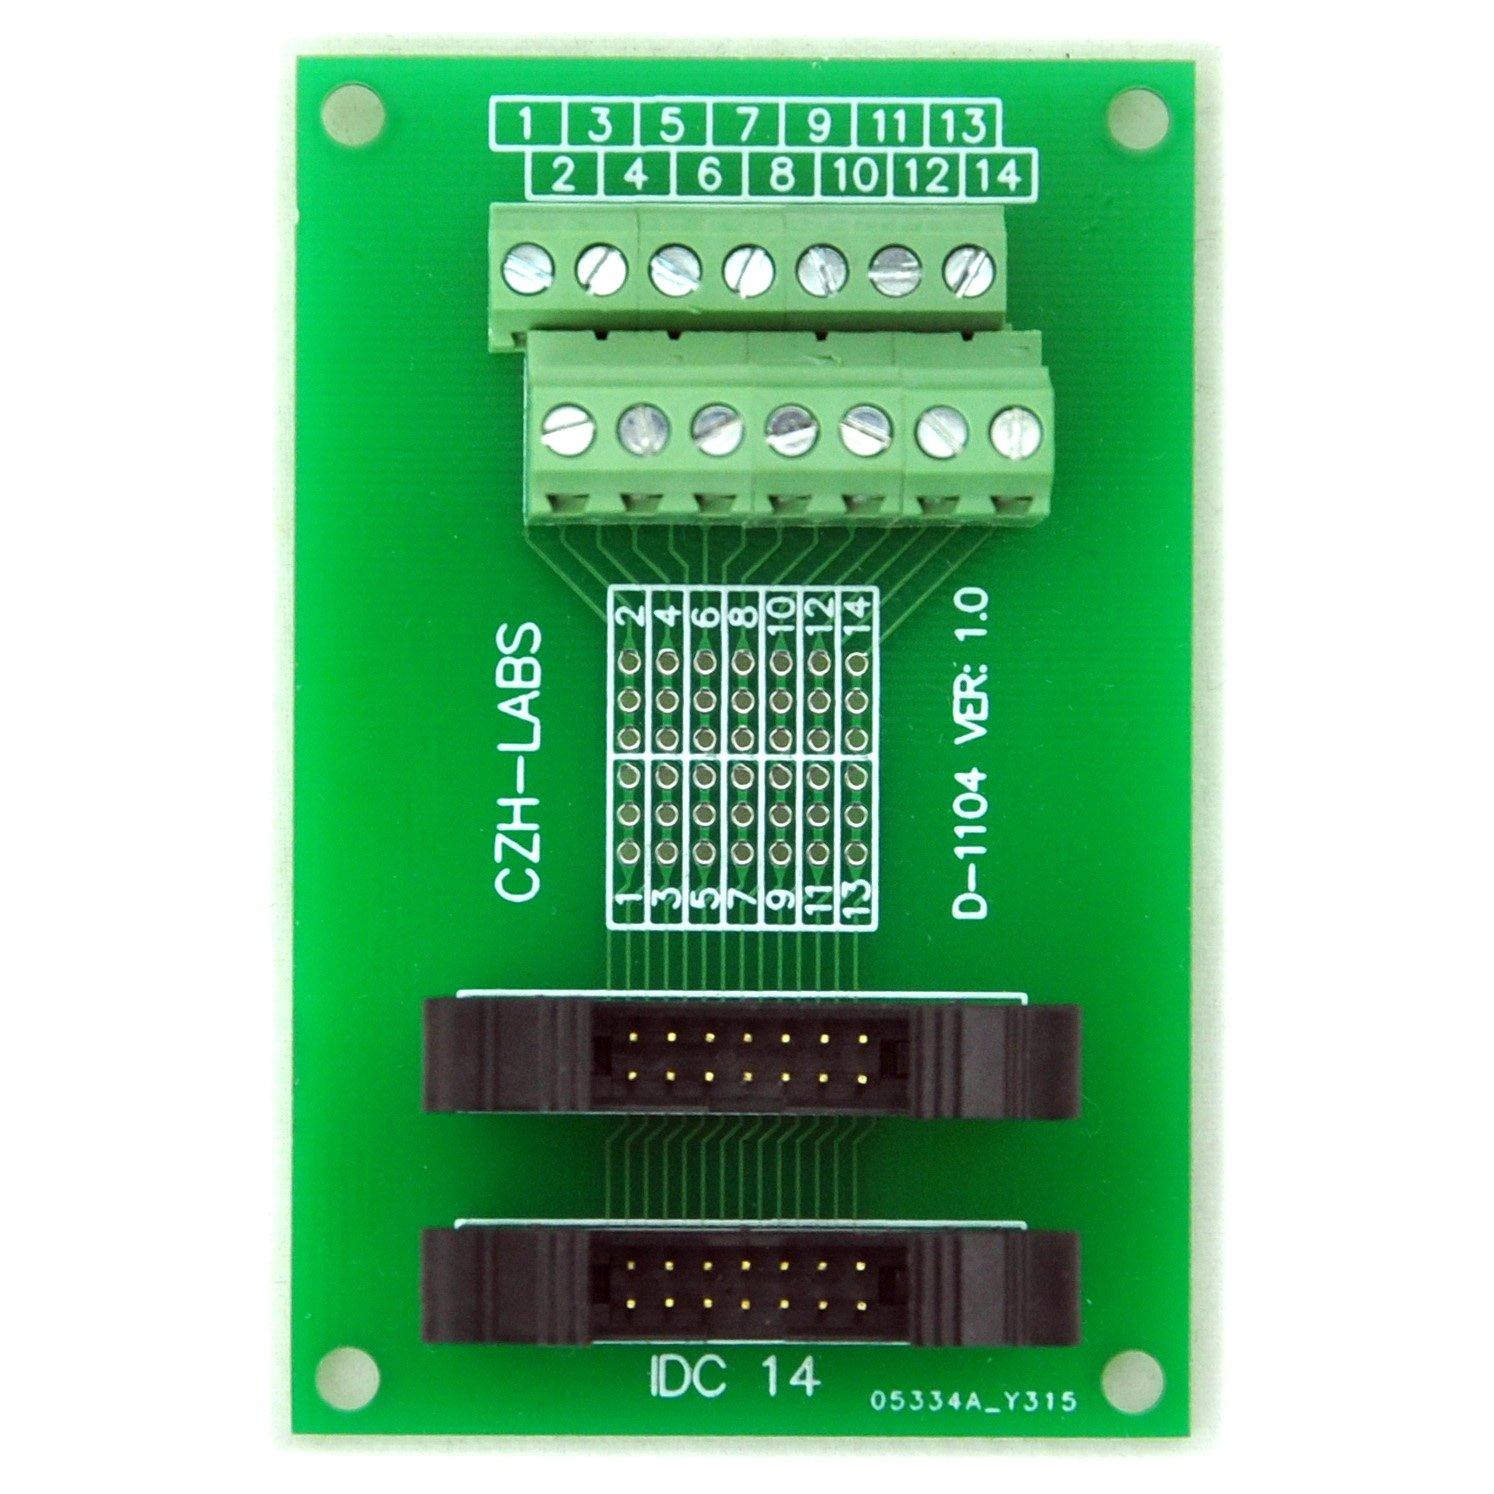 Electronics-Salon IDC-14 2x7pins 2.0mm Dual Male Header Breakout Board, Screw Terminal Connector.